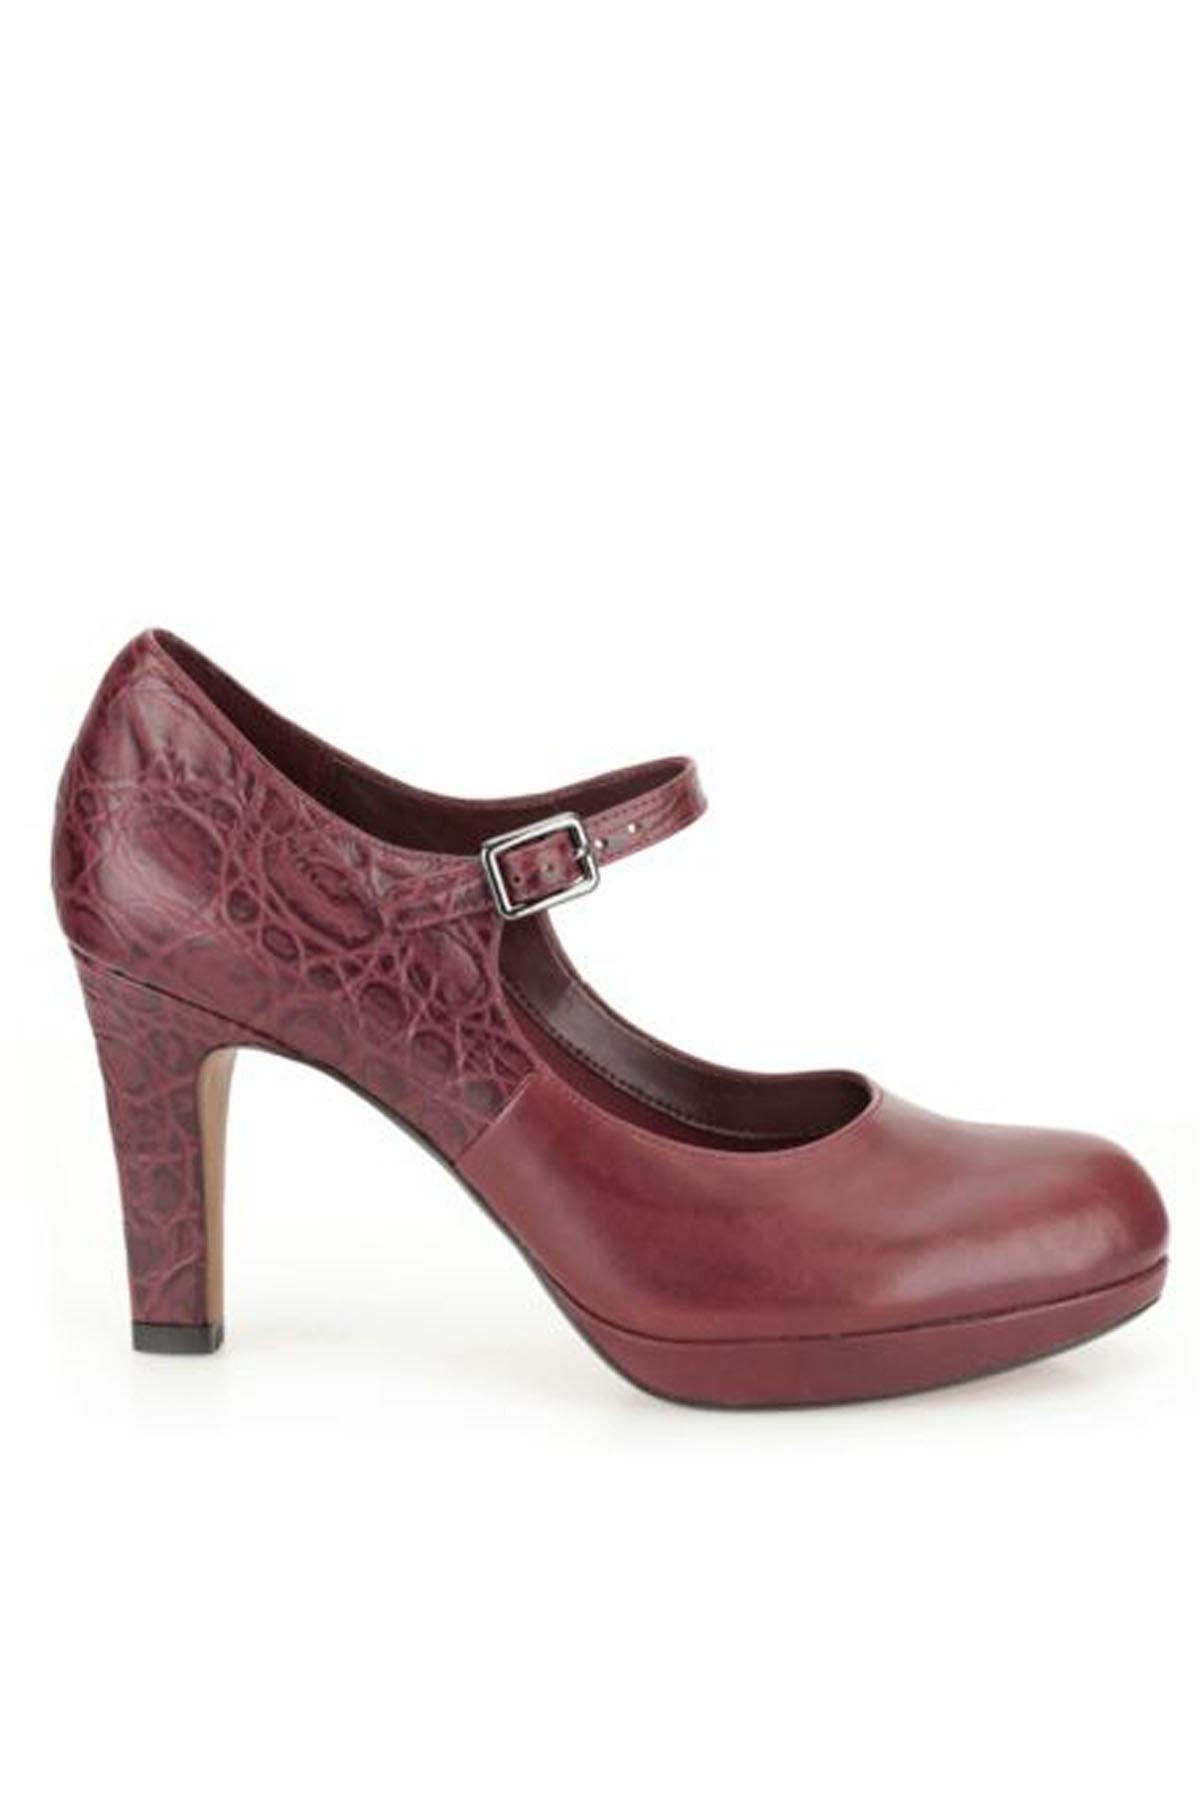 CLARKS Kadın Angıe Kendra Topuklu Ayakkabı 2